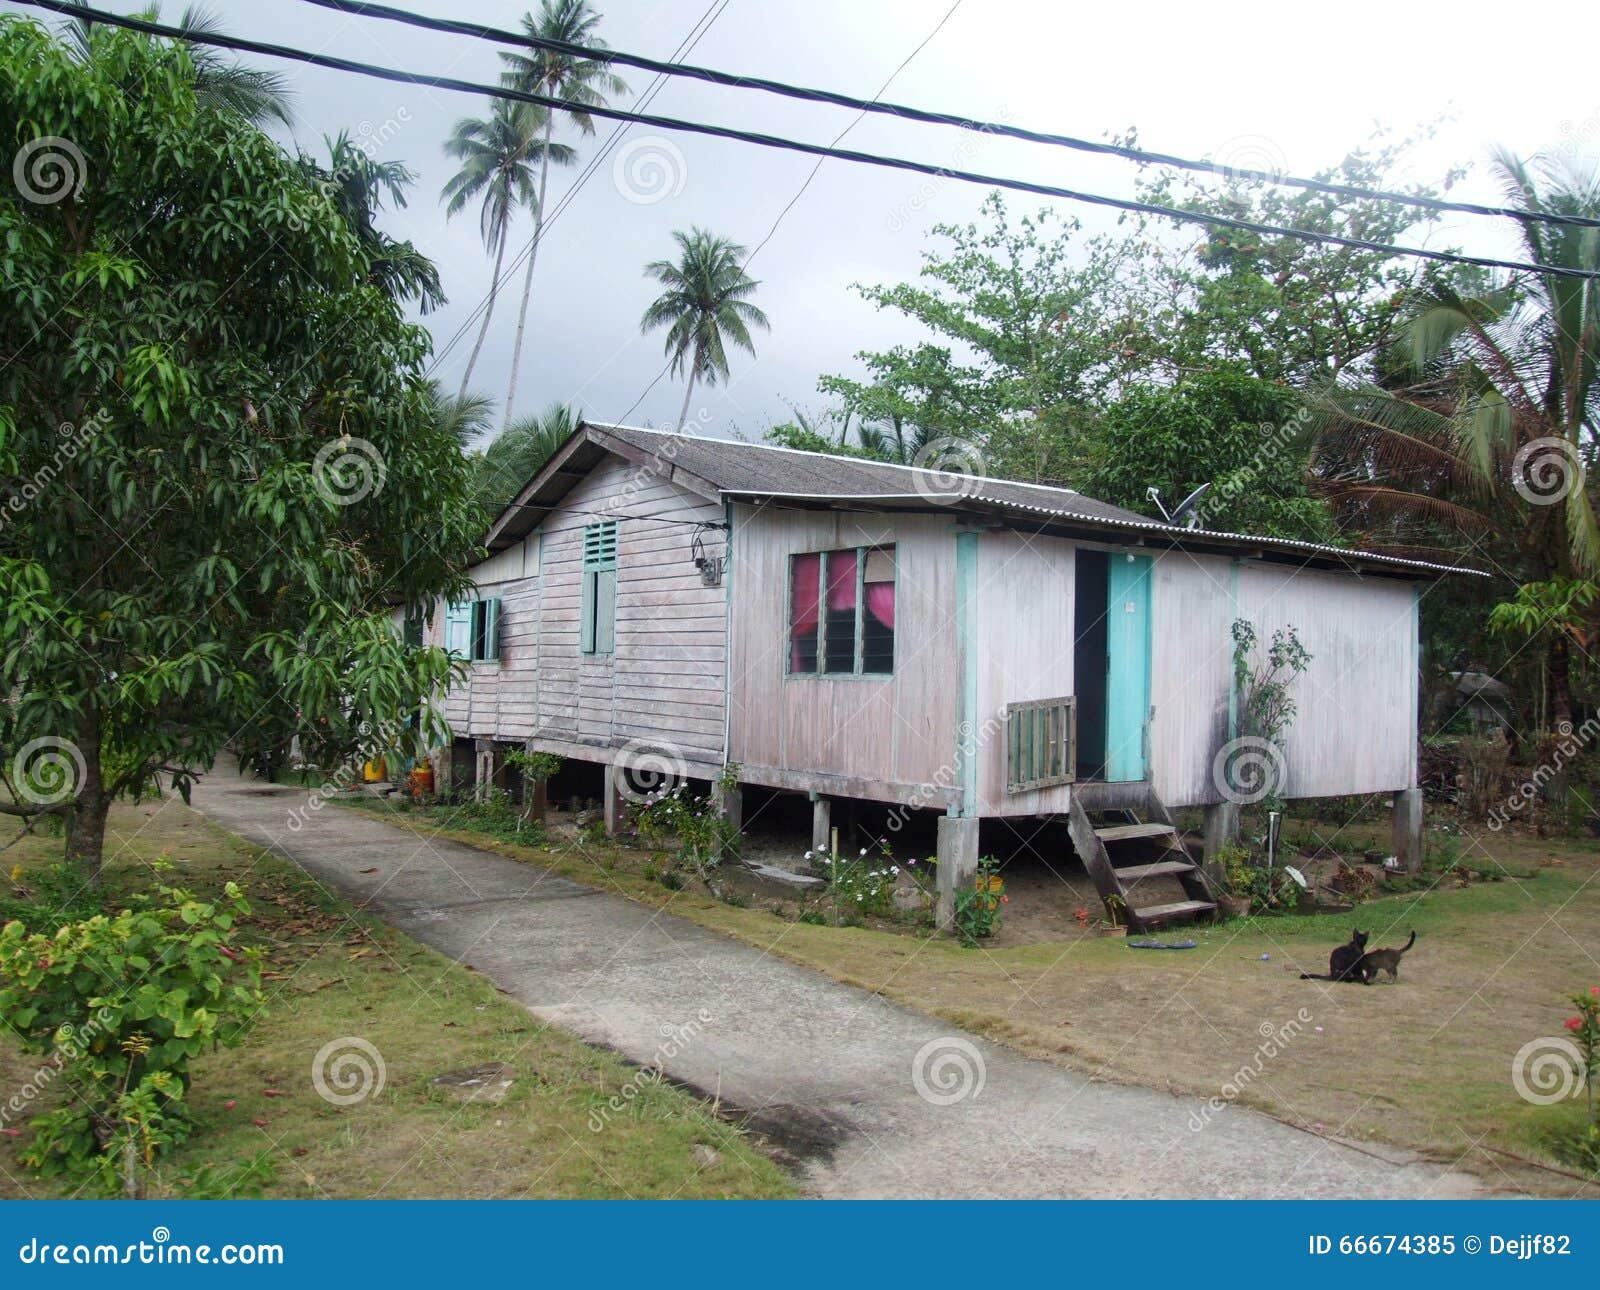 House Of Locals In Juara Village Tioman Island Stock Image Image